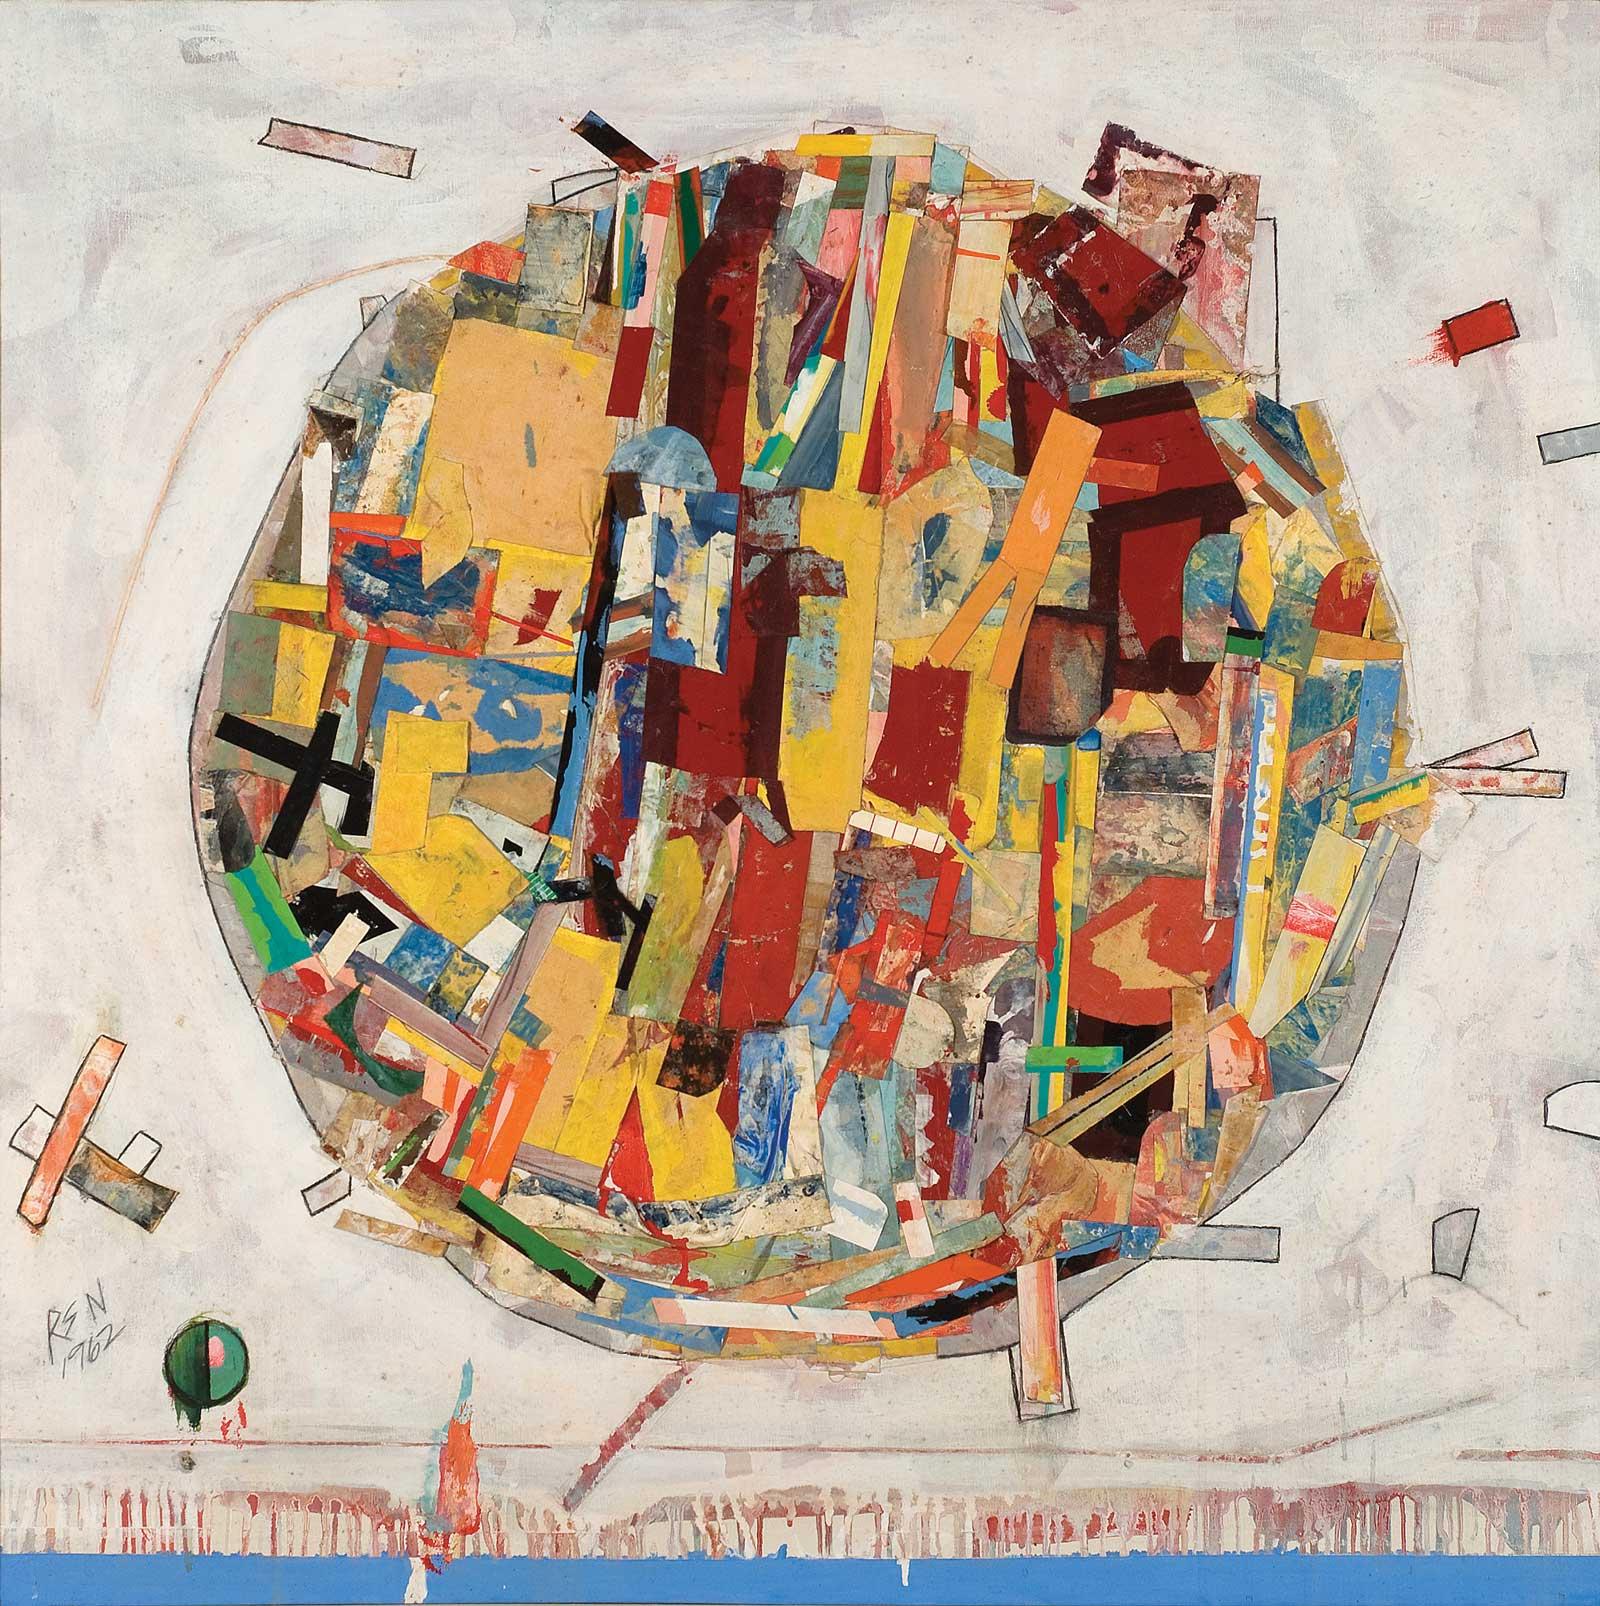 Pedazos del Mundo #19  by Robert S. Neuman